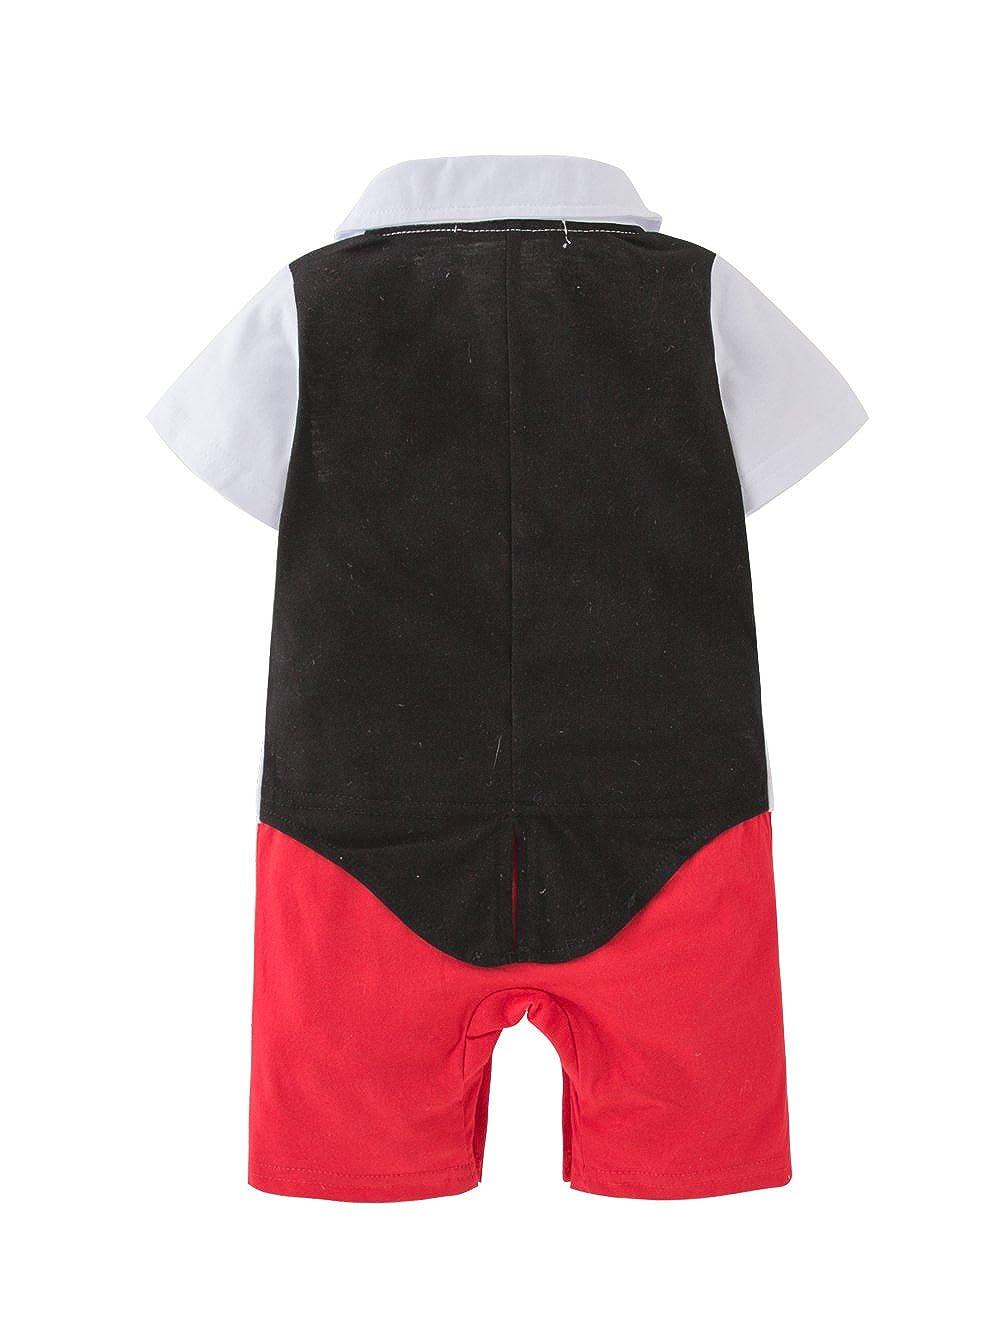 XM Nyan Mays Baby Toddler Boy Bow Tie Tuxedo Pants